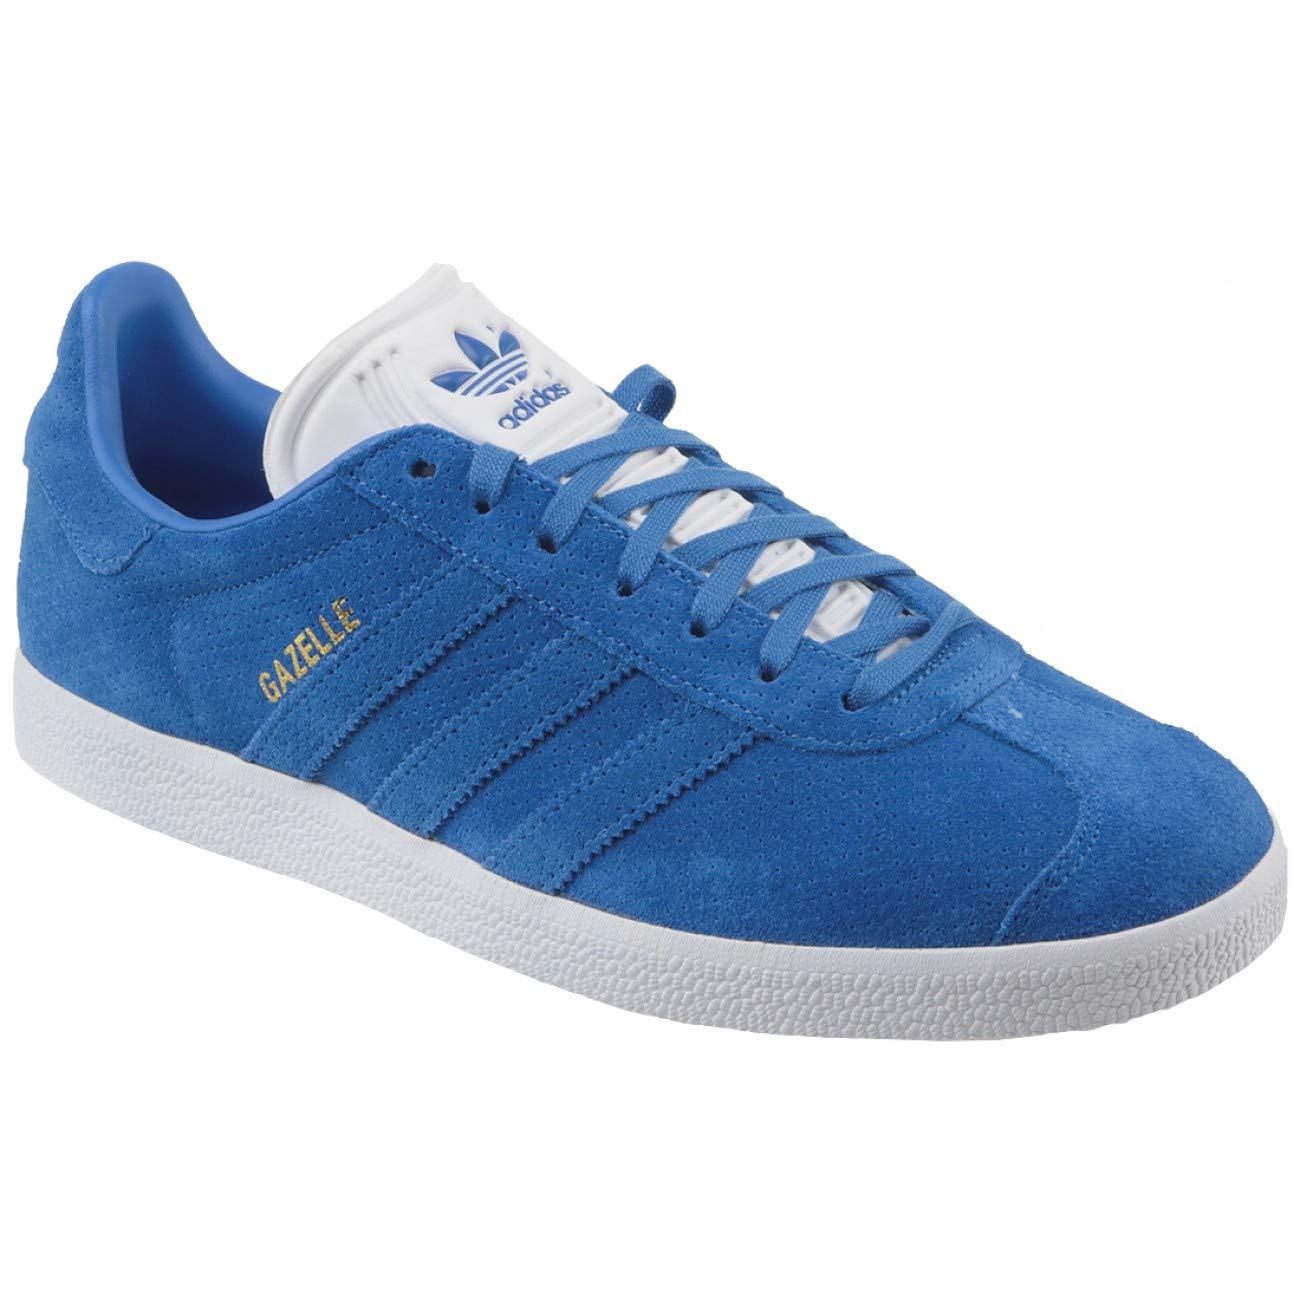 buy popular faf9e f059b adidas Gazelle, Chaussures de Fitness Homme MainApps 11956. Agrandir l image